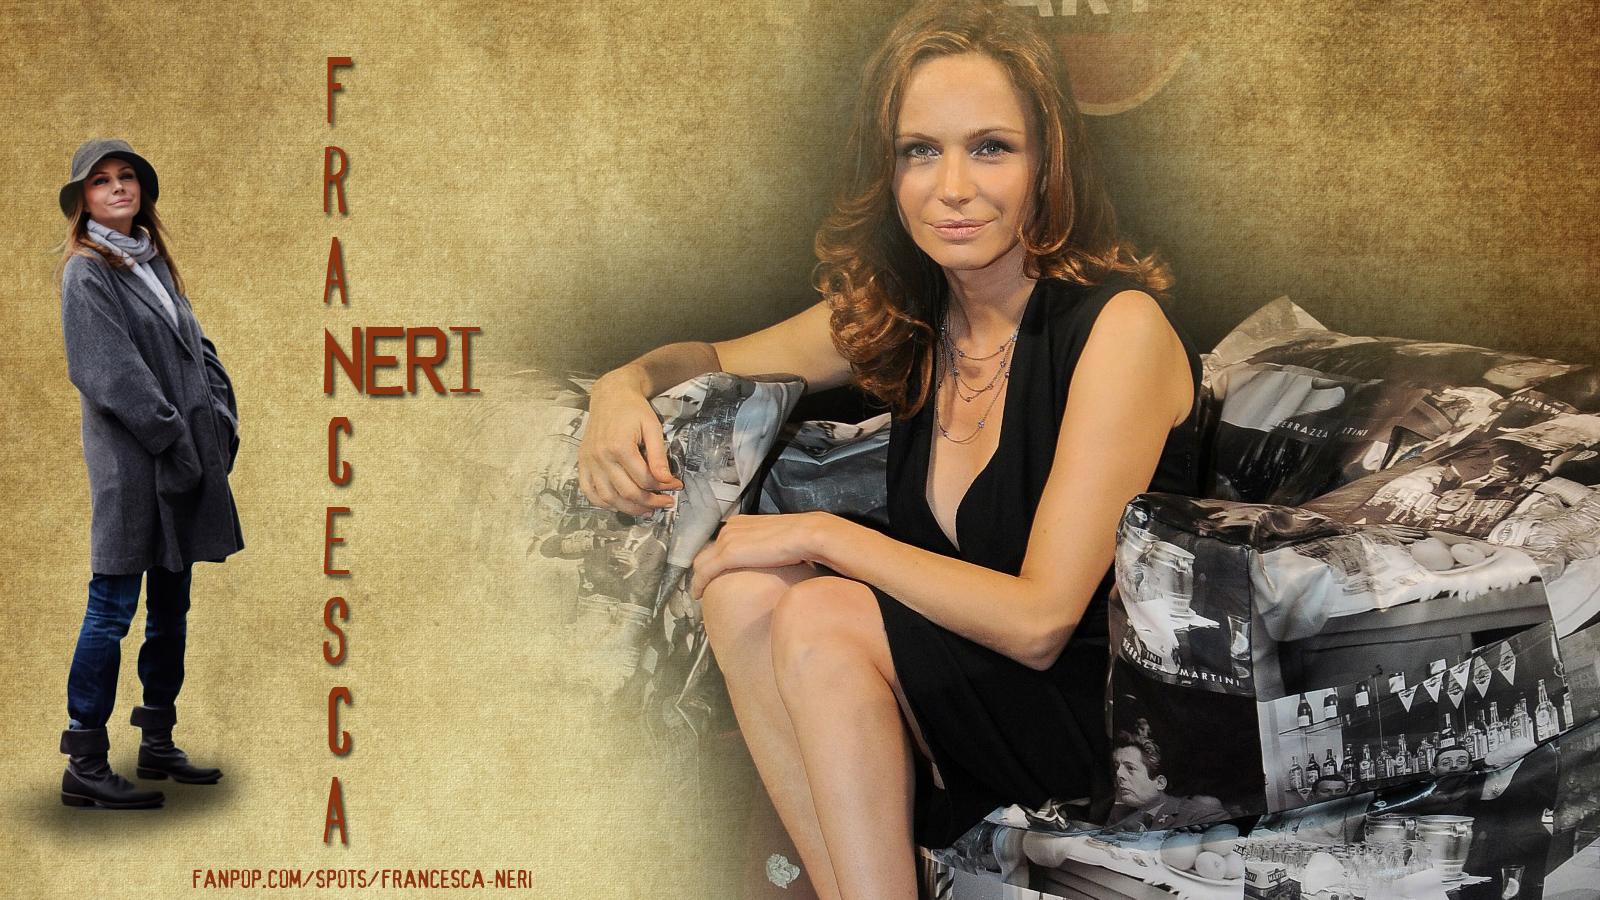 Joanna McCallum Adult movies Jenna Elfman born September 30, 1971 (age 47),Olivia Alaina May